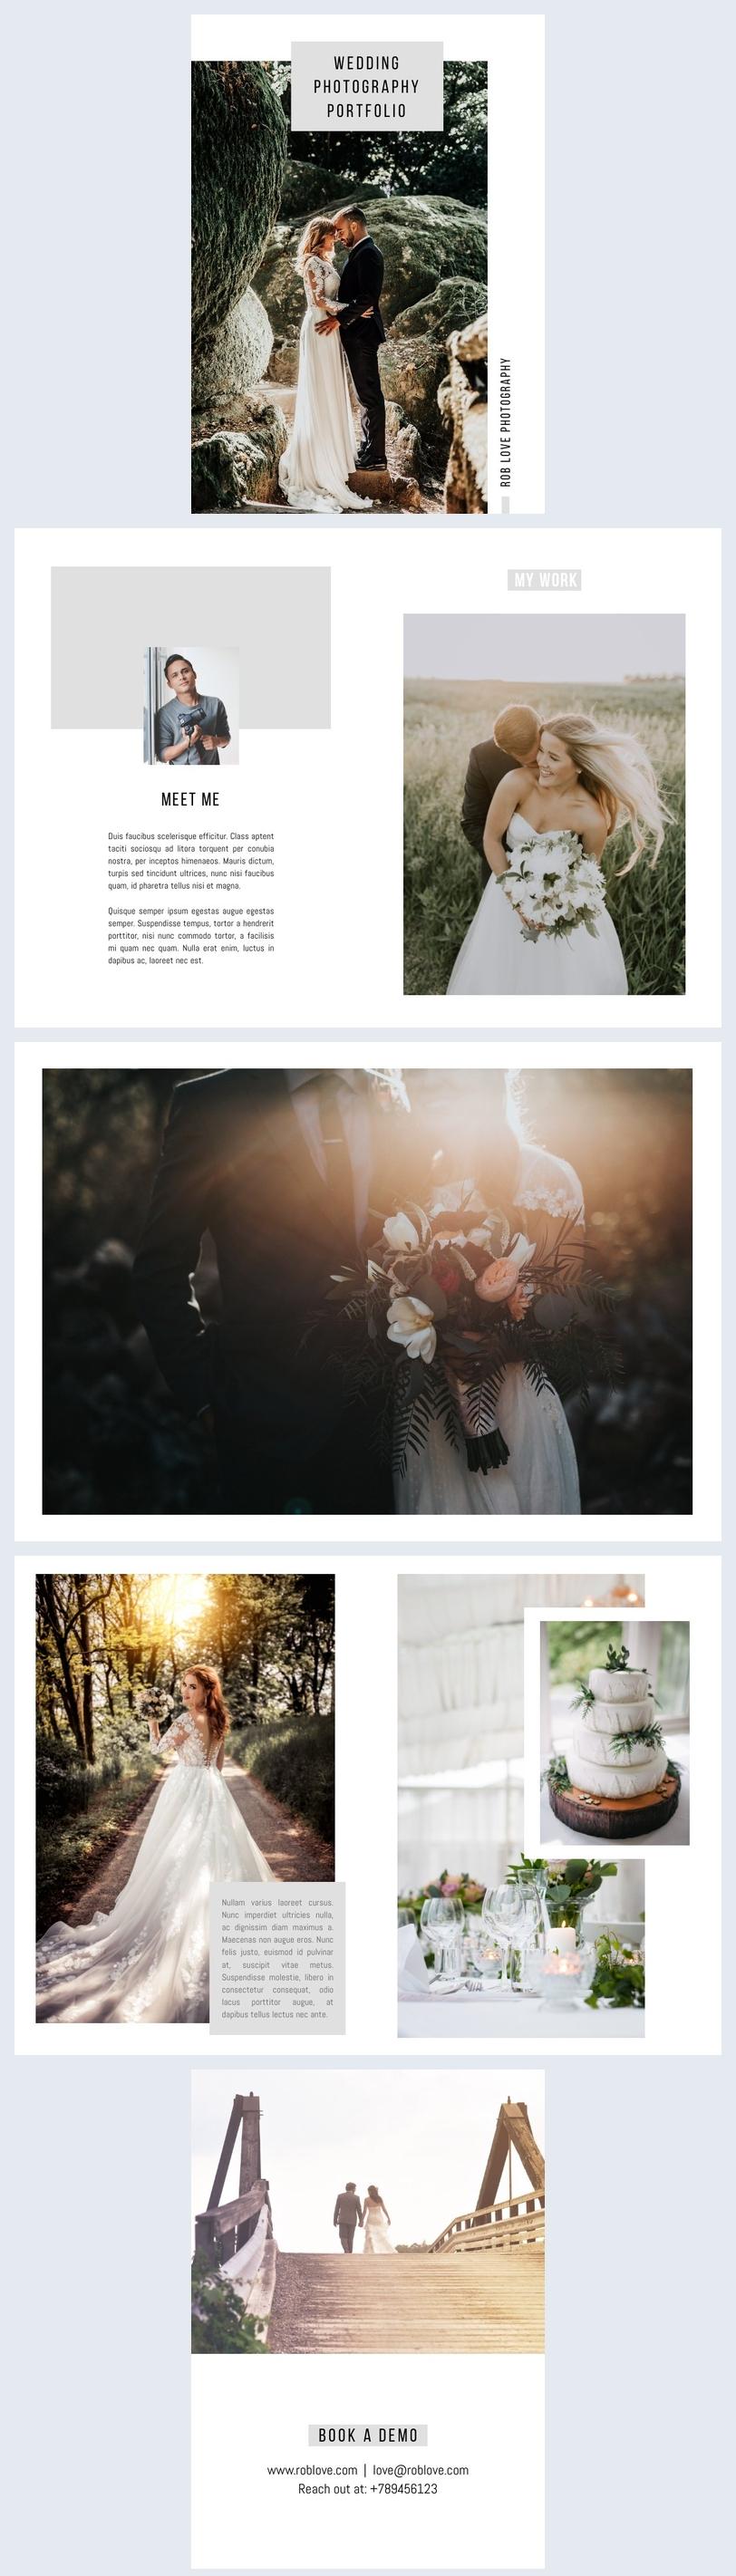 wedding photography portfolio design